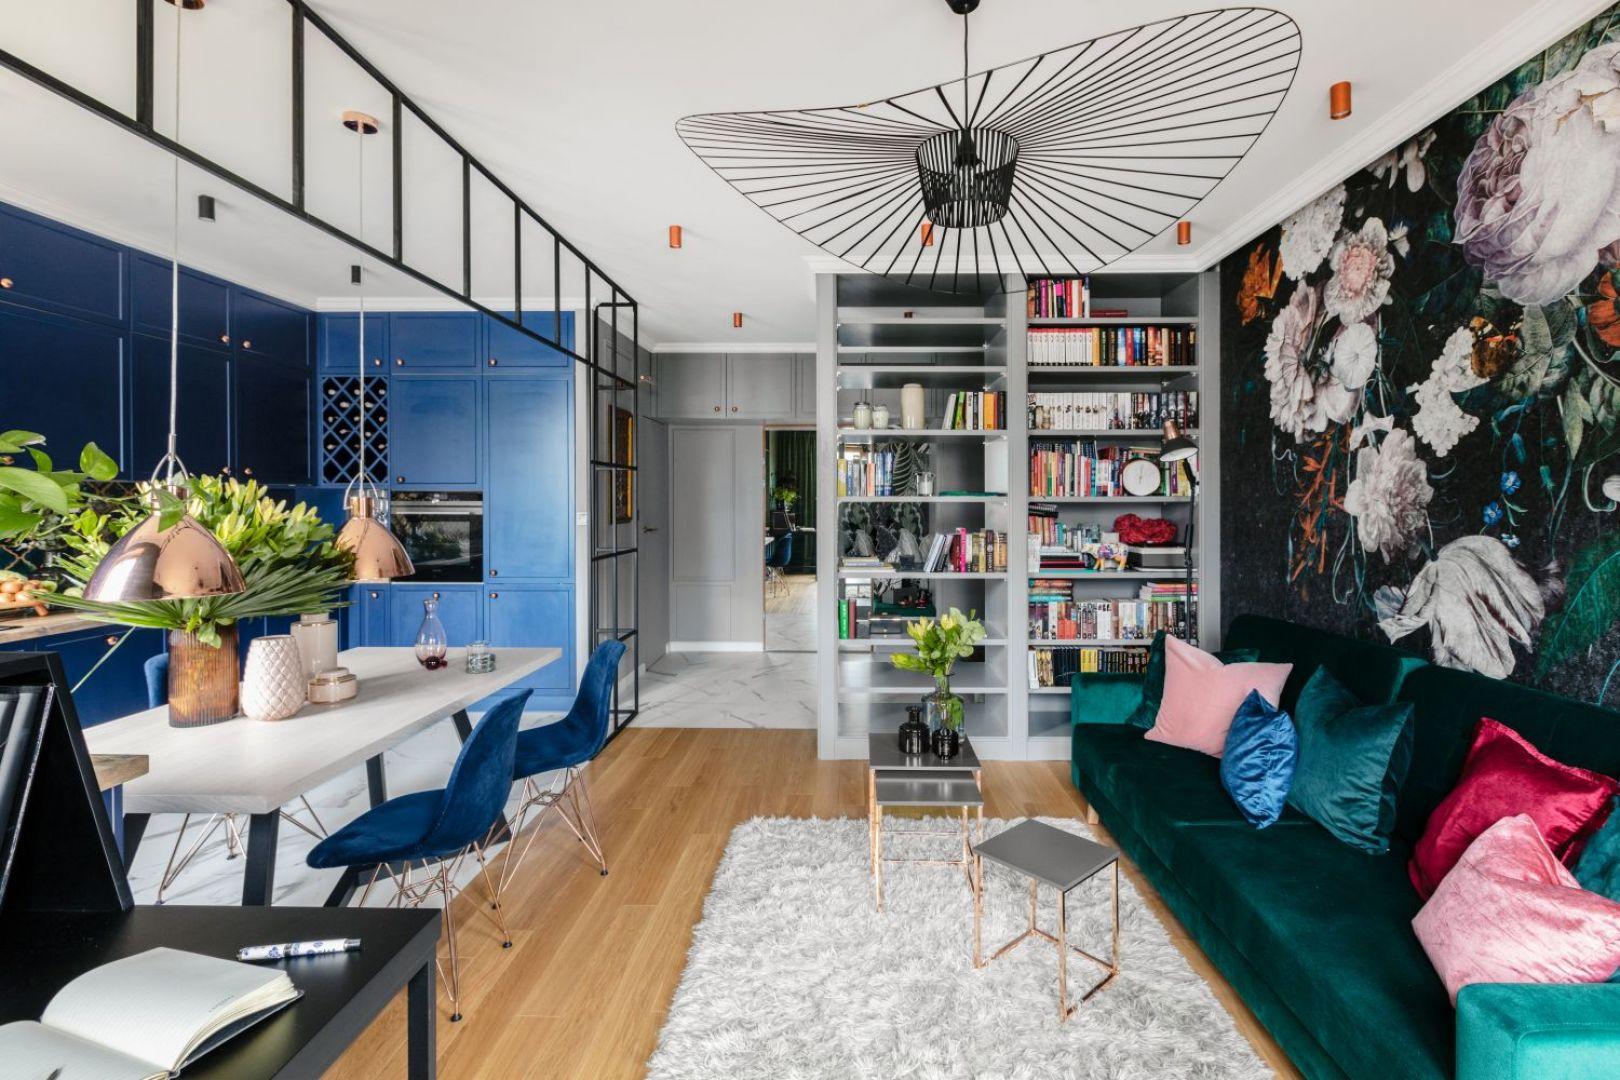 Zielona sofa w salonie.Projekt Marta Wierzbicka-Patejuk. Fot. Aleksandra Dermont